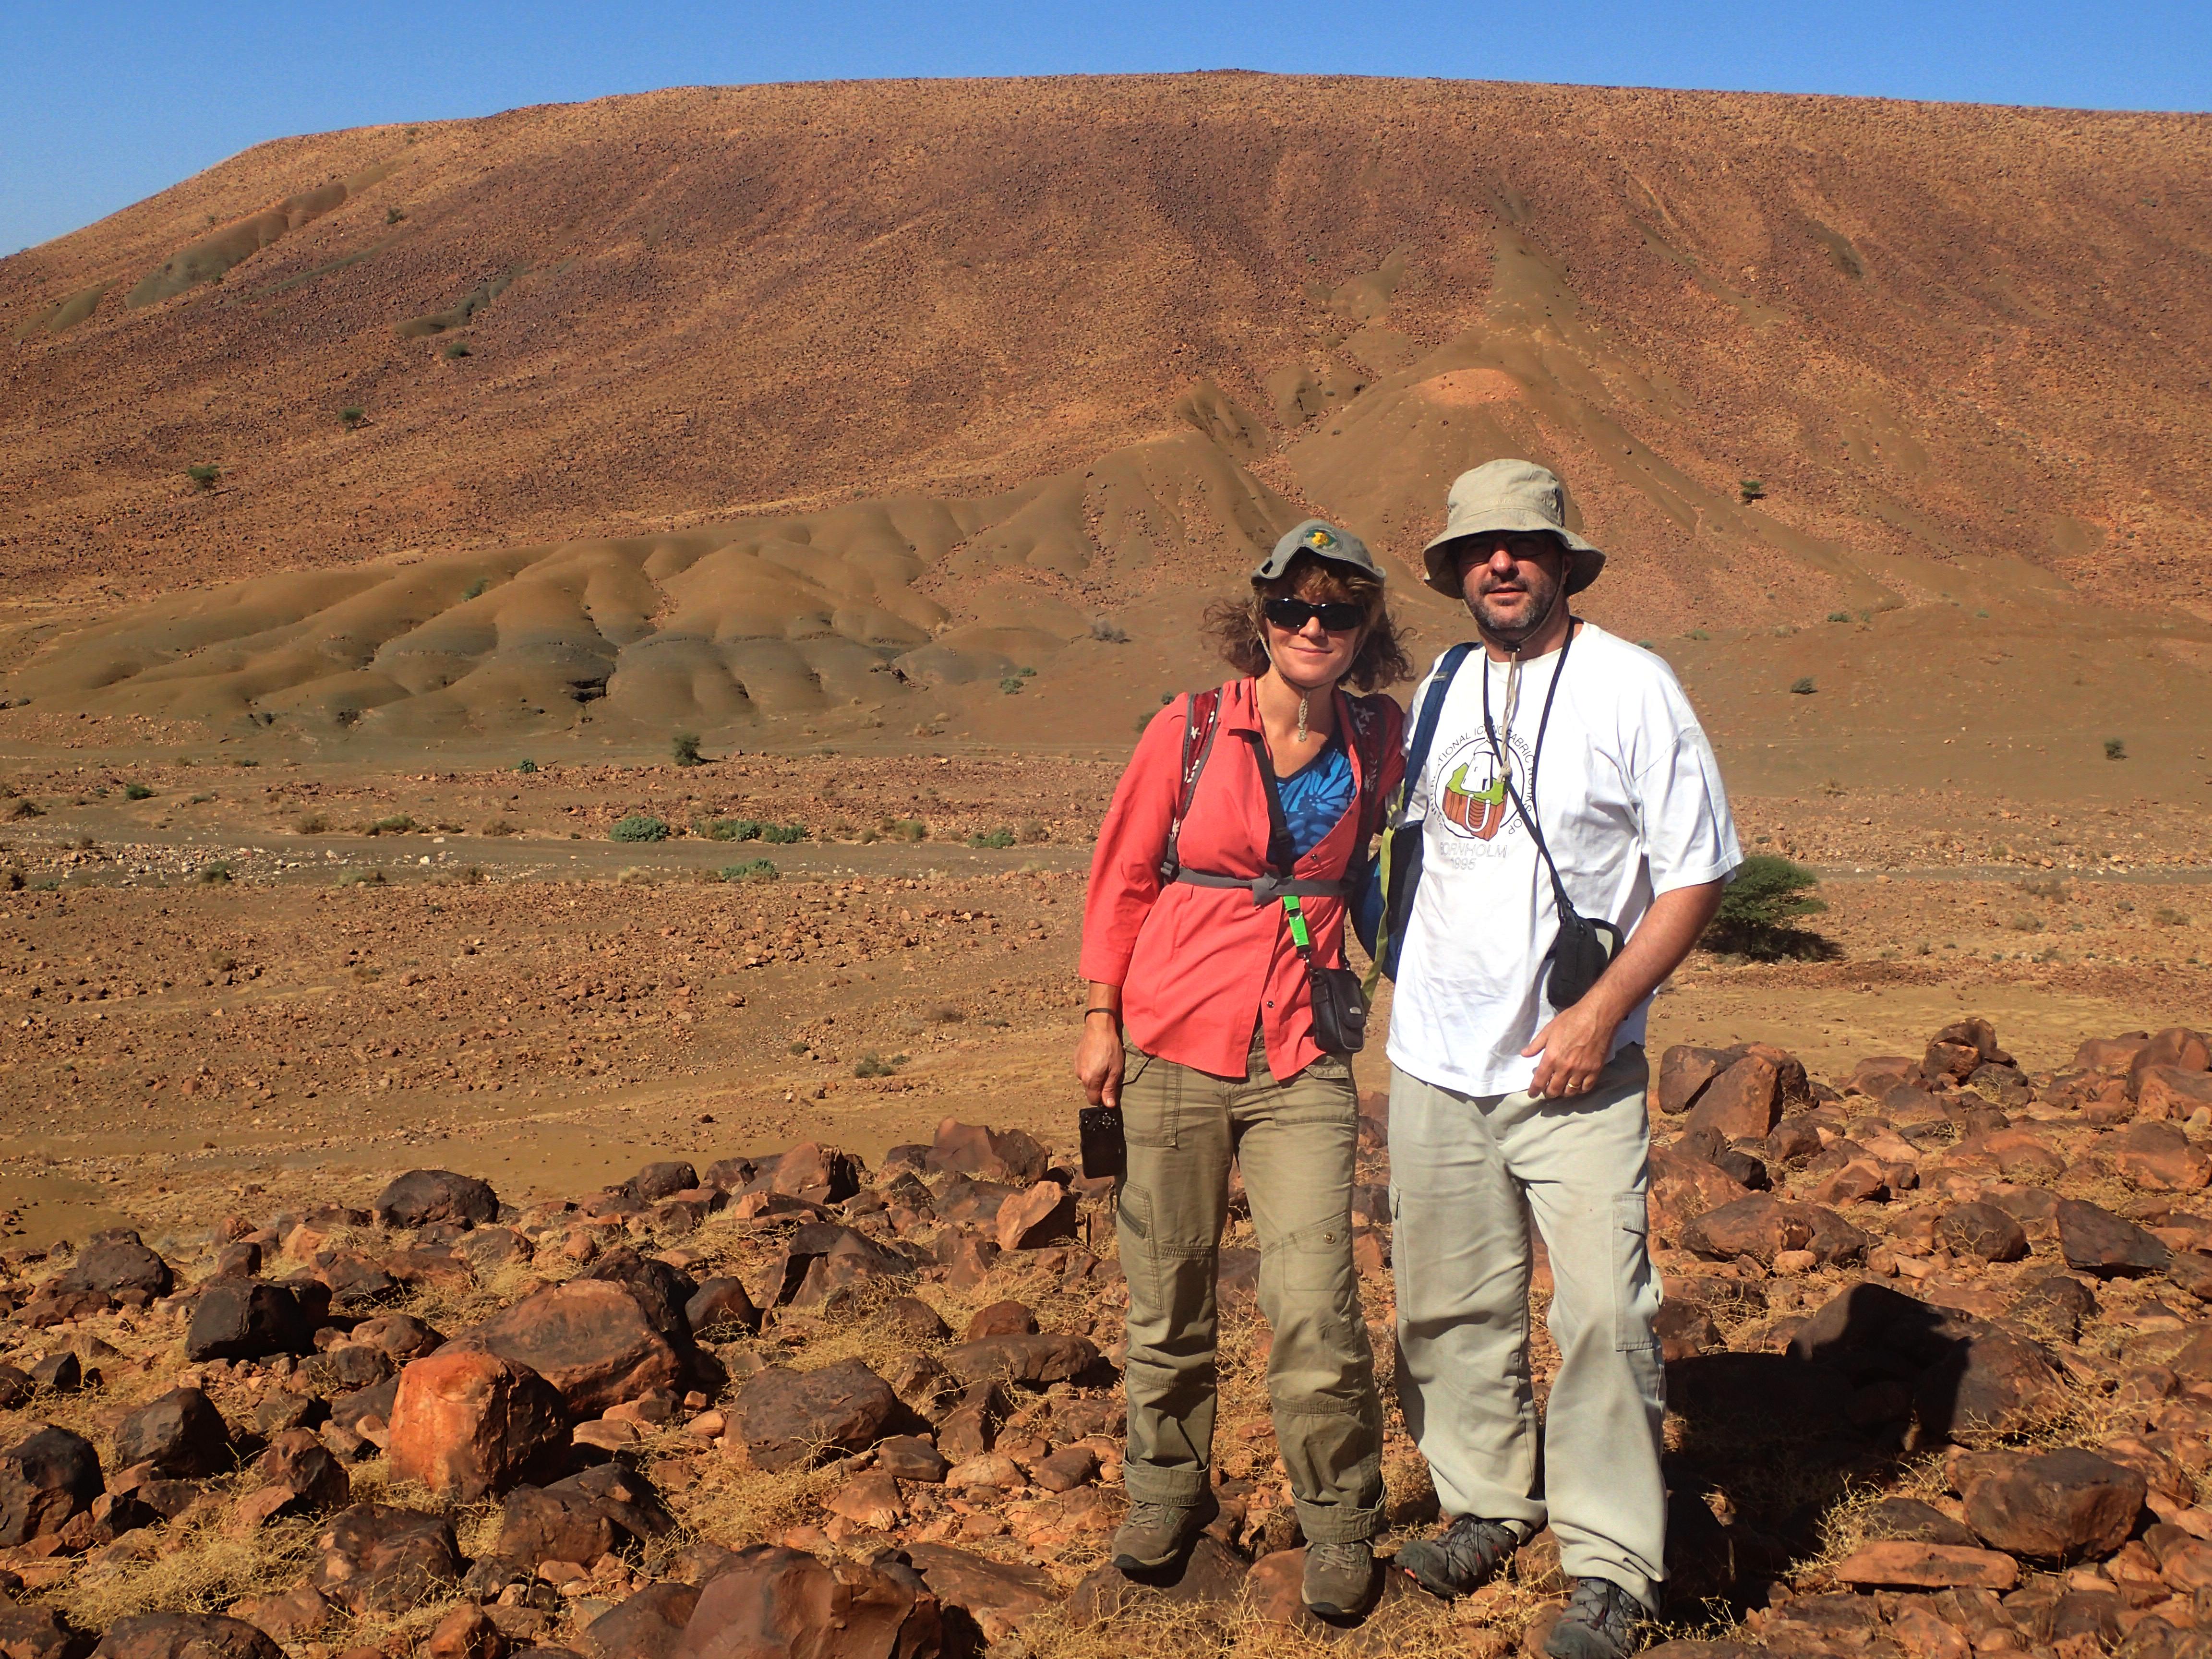 USask paleobiologists Gabriela Mángano and Luis Buatois